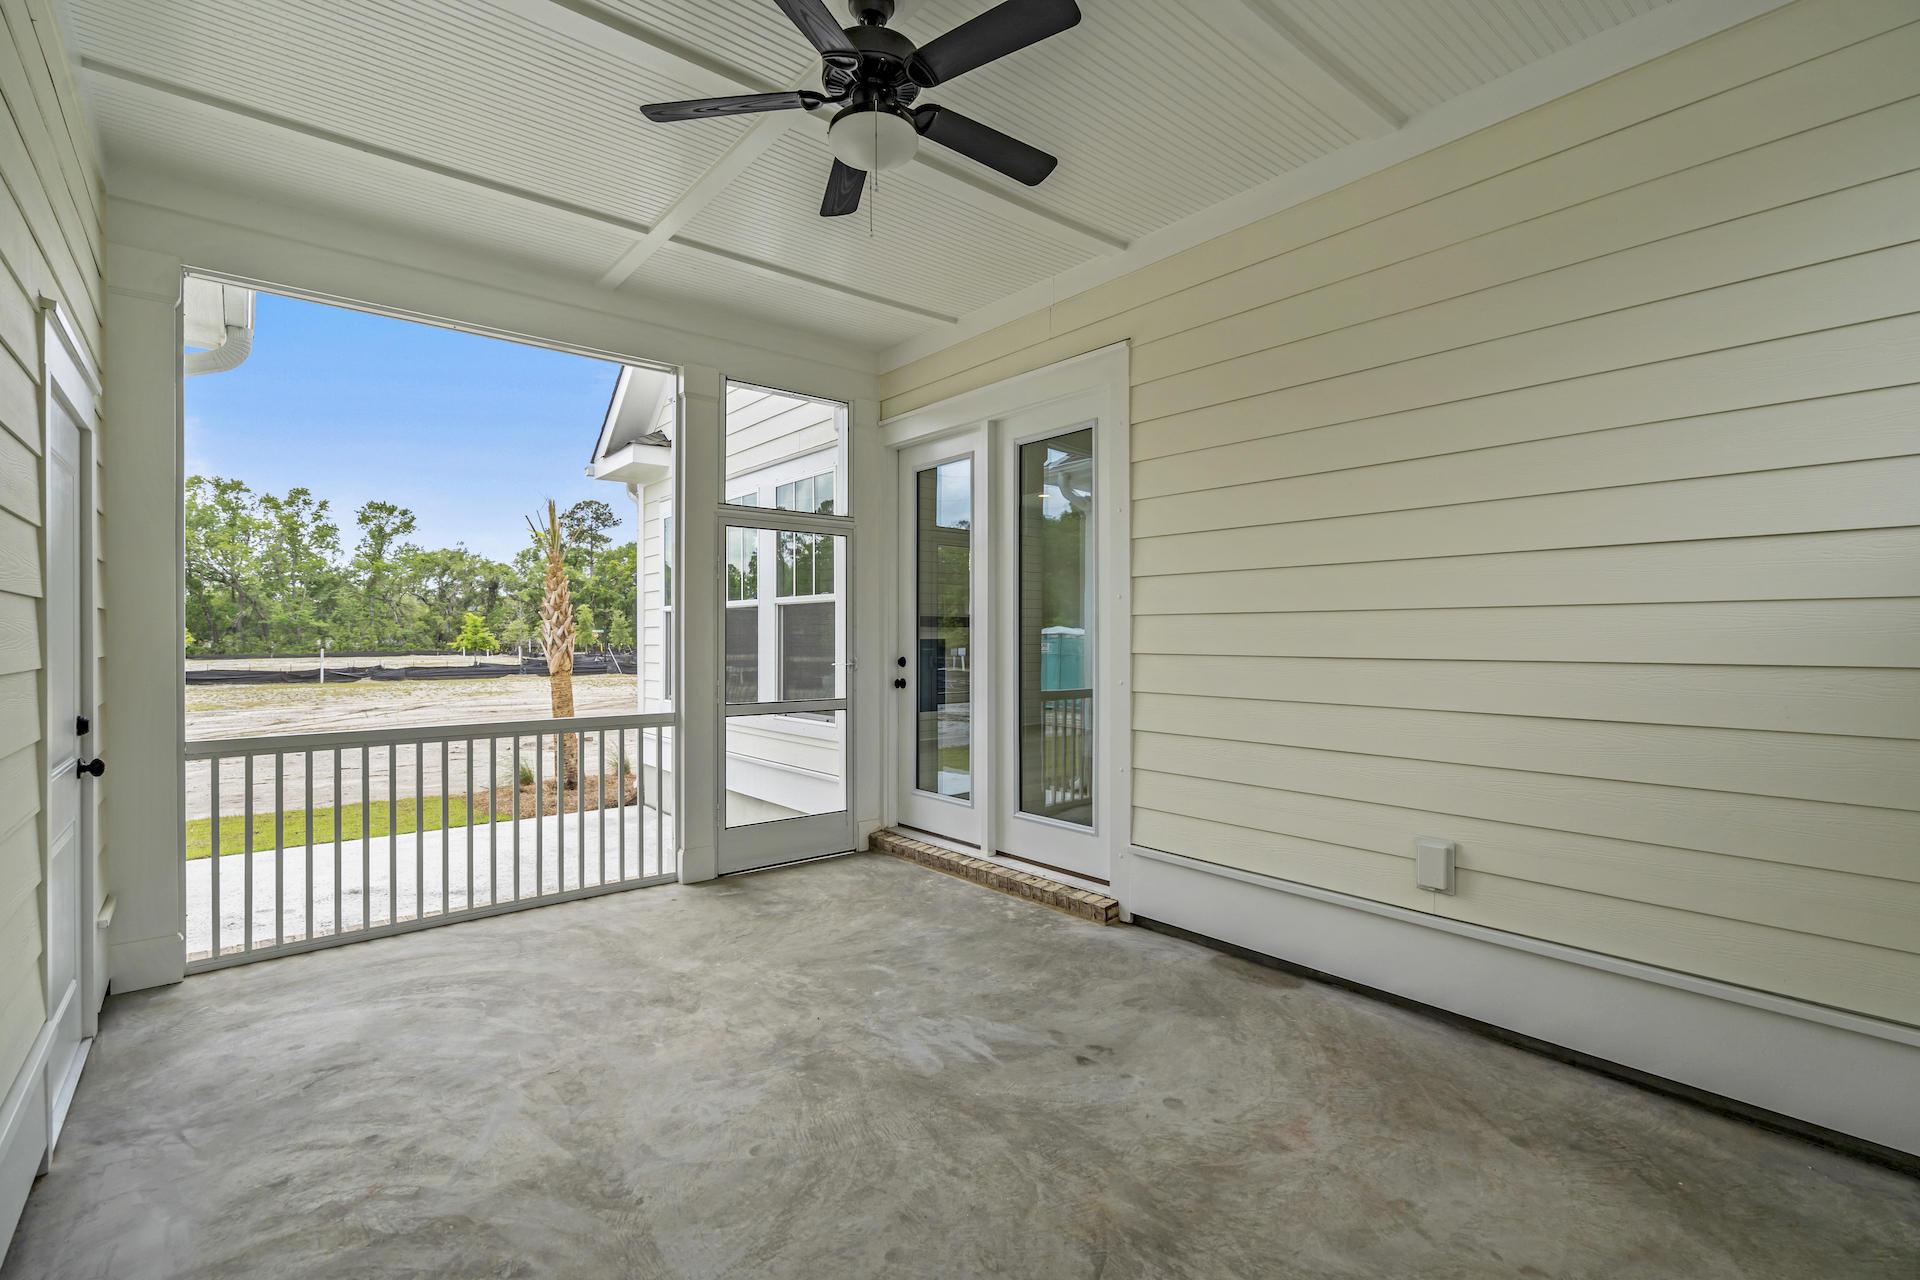 Midtown Homes For Sale - 1320 Upper Union, Mount Pleasant, SC - 4